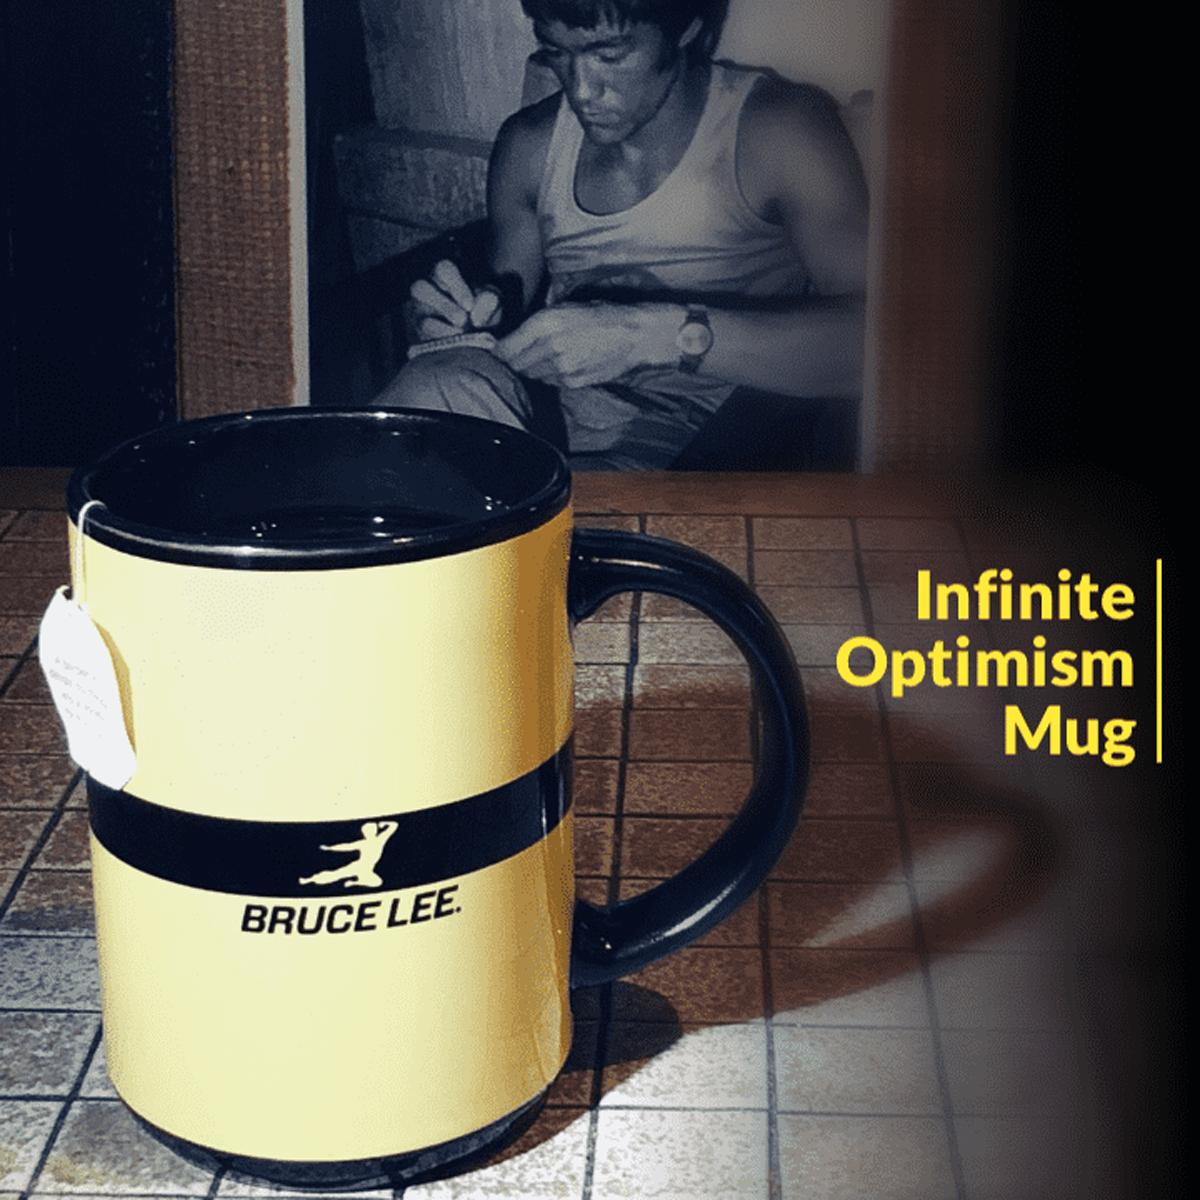 Infinite Optimism 15oz. Mug